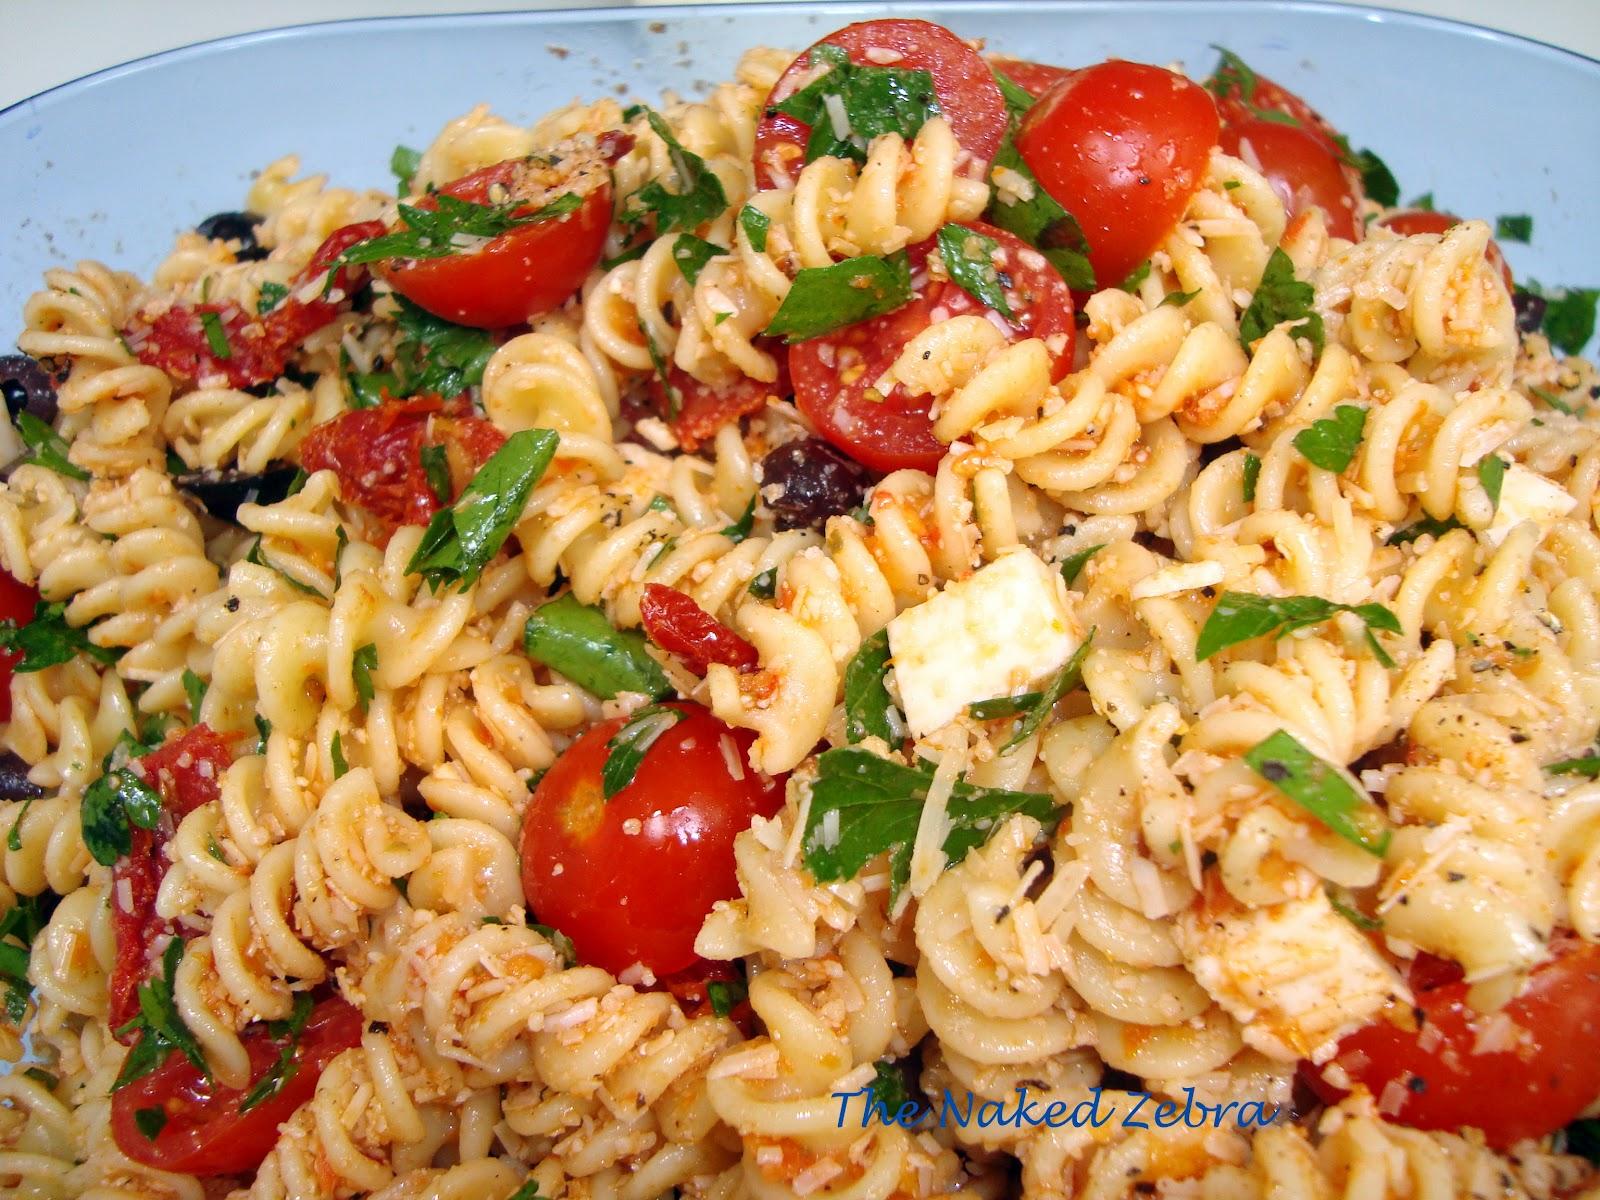 Barefoot Contessa Salad Recipes barefoot contessa pasta salad recipe - food baskets recipes